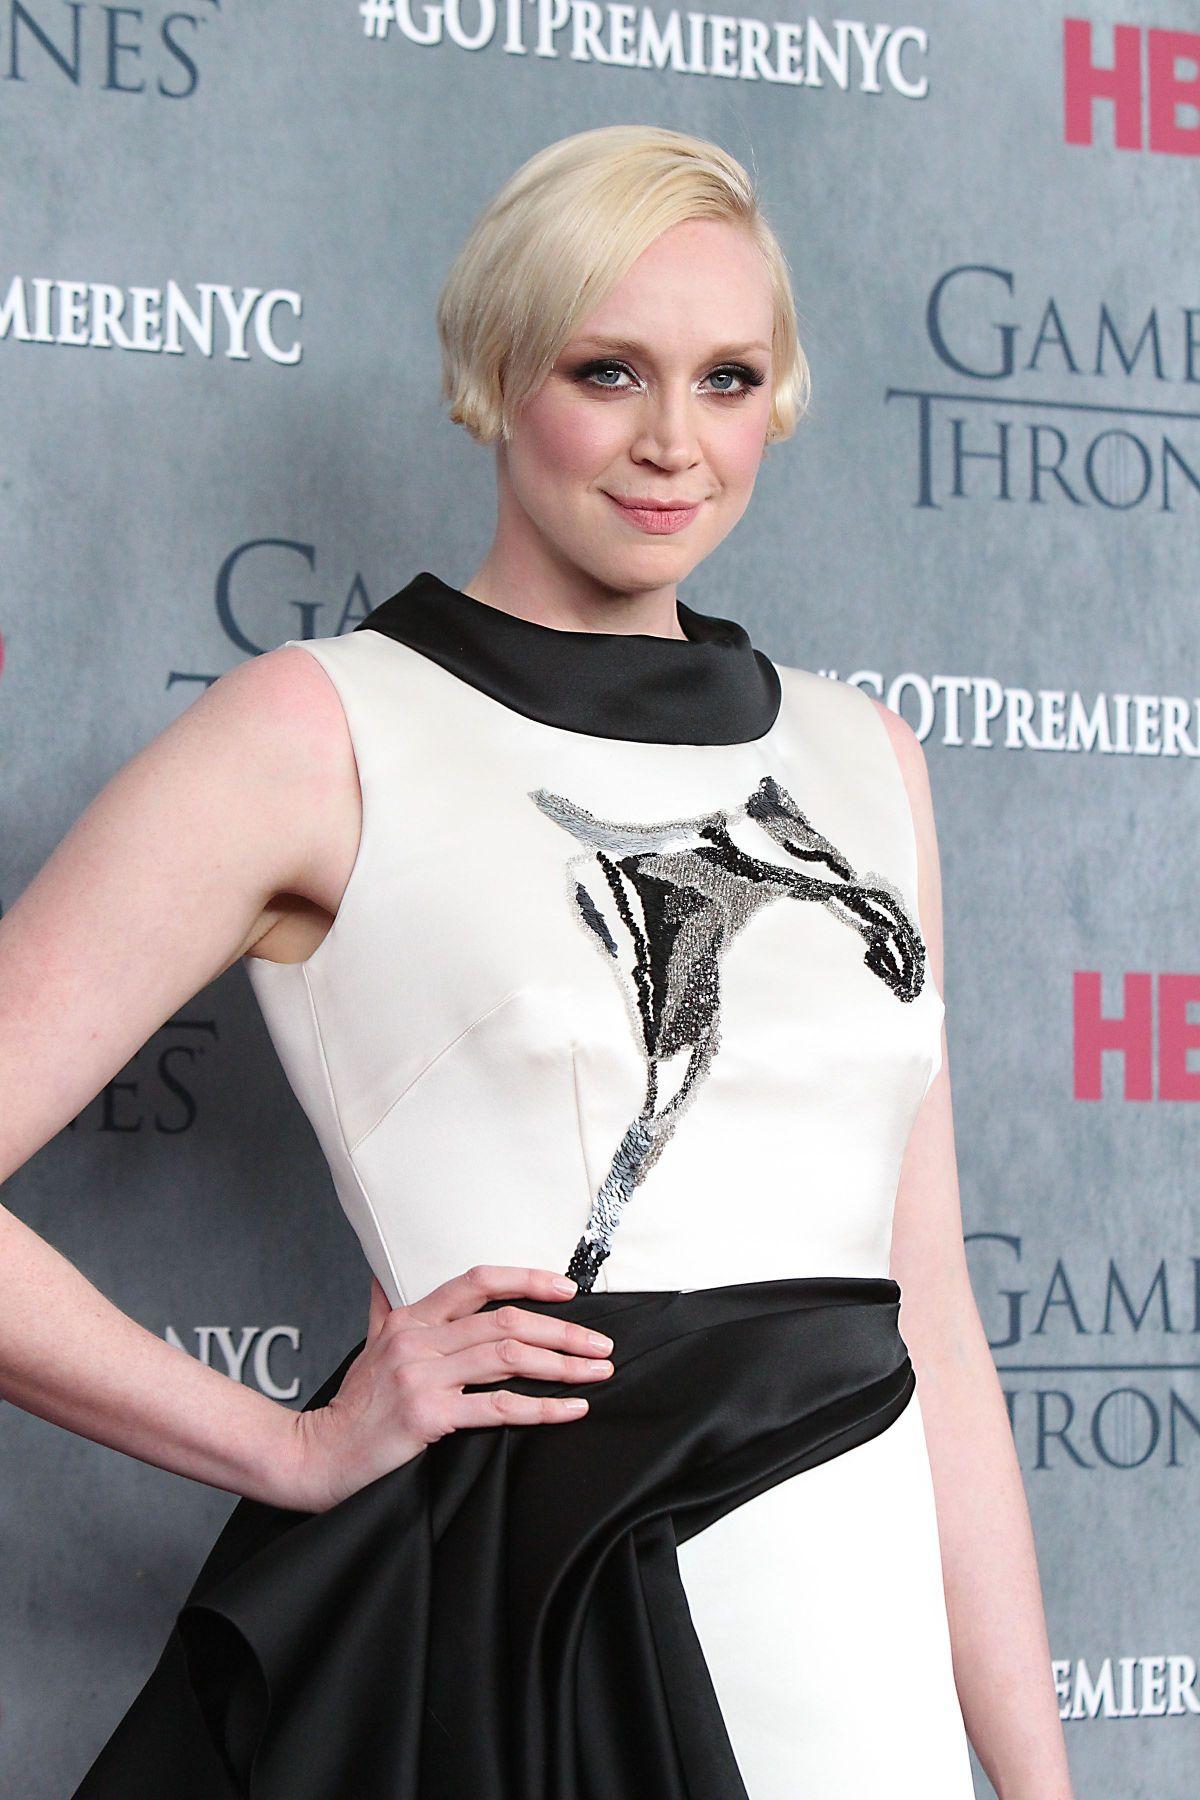 GWENDOLINE CHRISTIE at Game of Thrones Fourth Season Premiere in New York